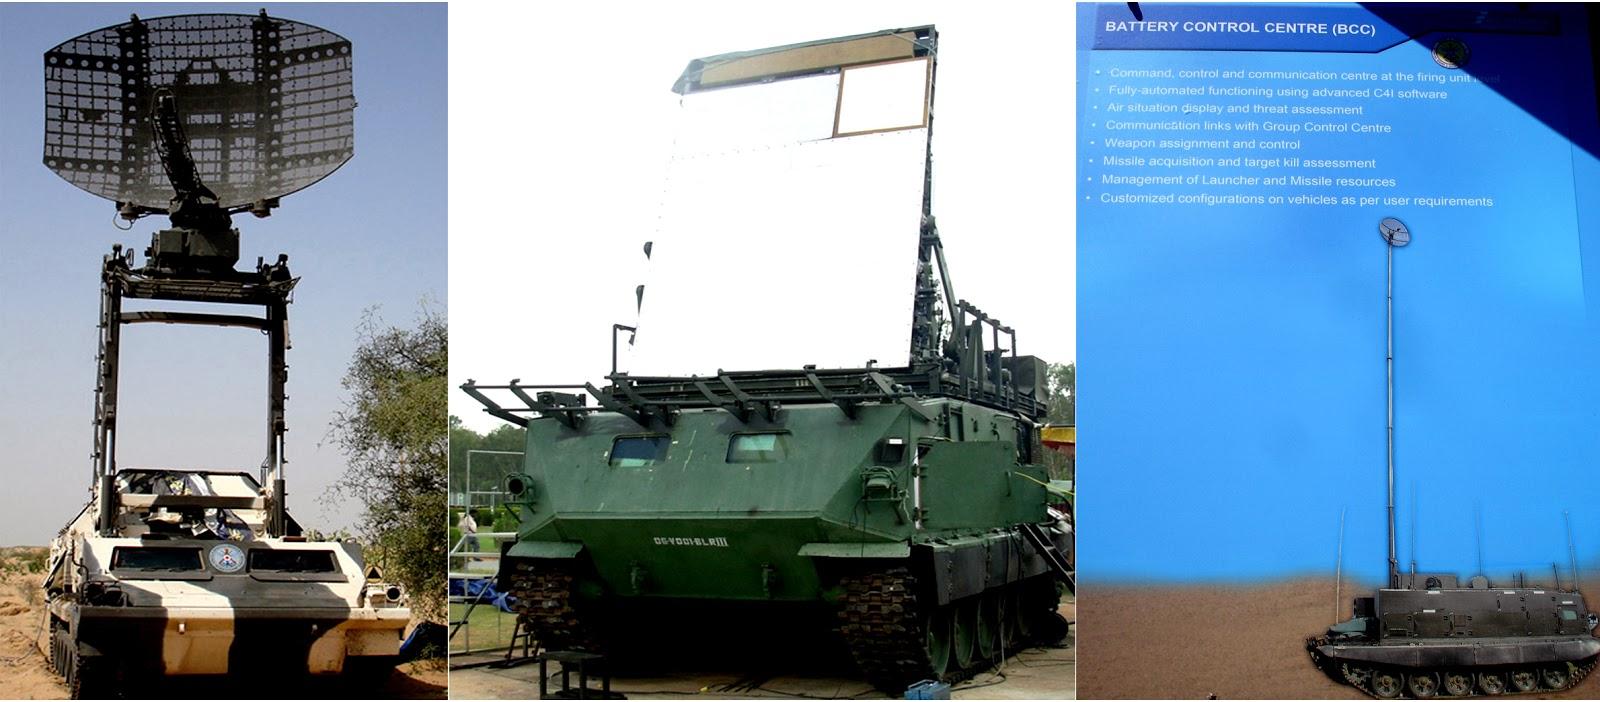 http://1.bp.blogspot.com/-bp4J8tSkf3A/UnvhQPtIxmI/AAAAAAAAGGo/vnXZ2VBIkg4/s1600/Akash+Mk1's+Indian+Army-specific+BSR+(left)+&+Rajendra+BLR+&+BCC.jpg